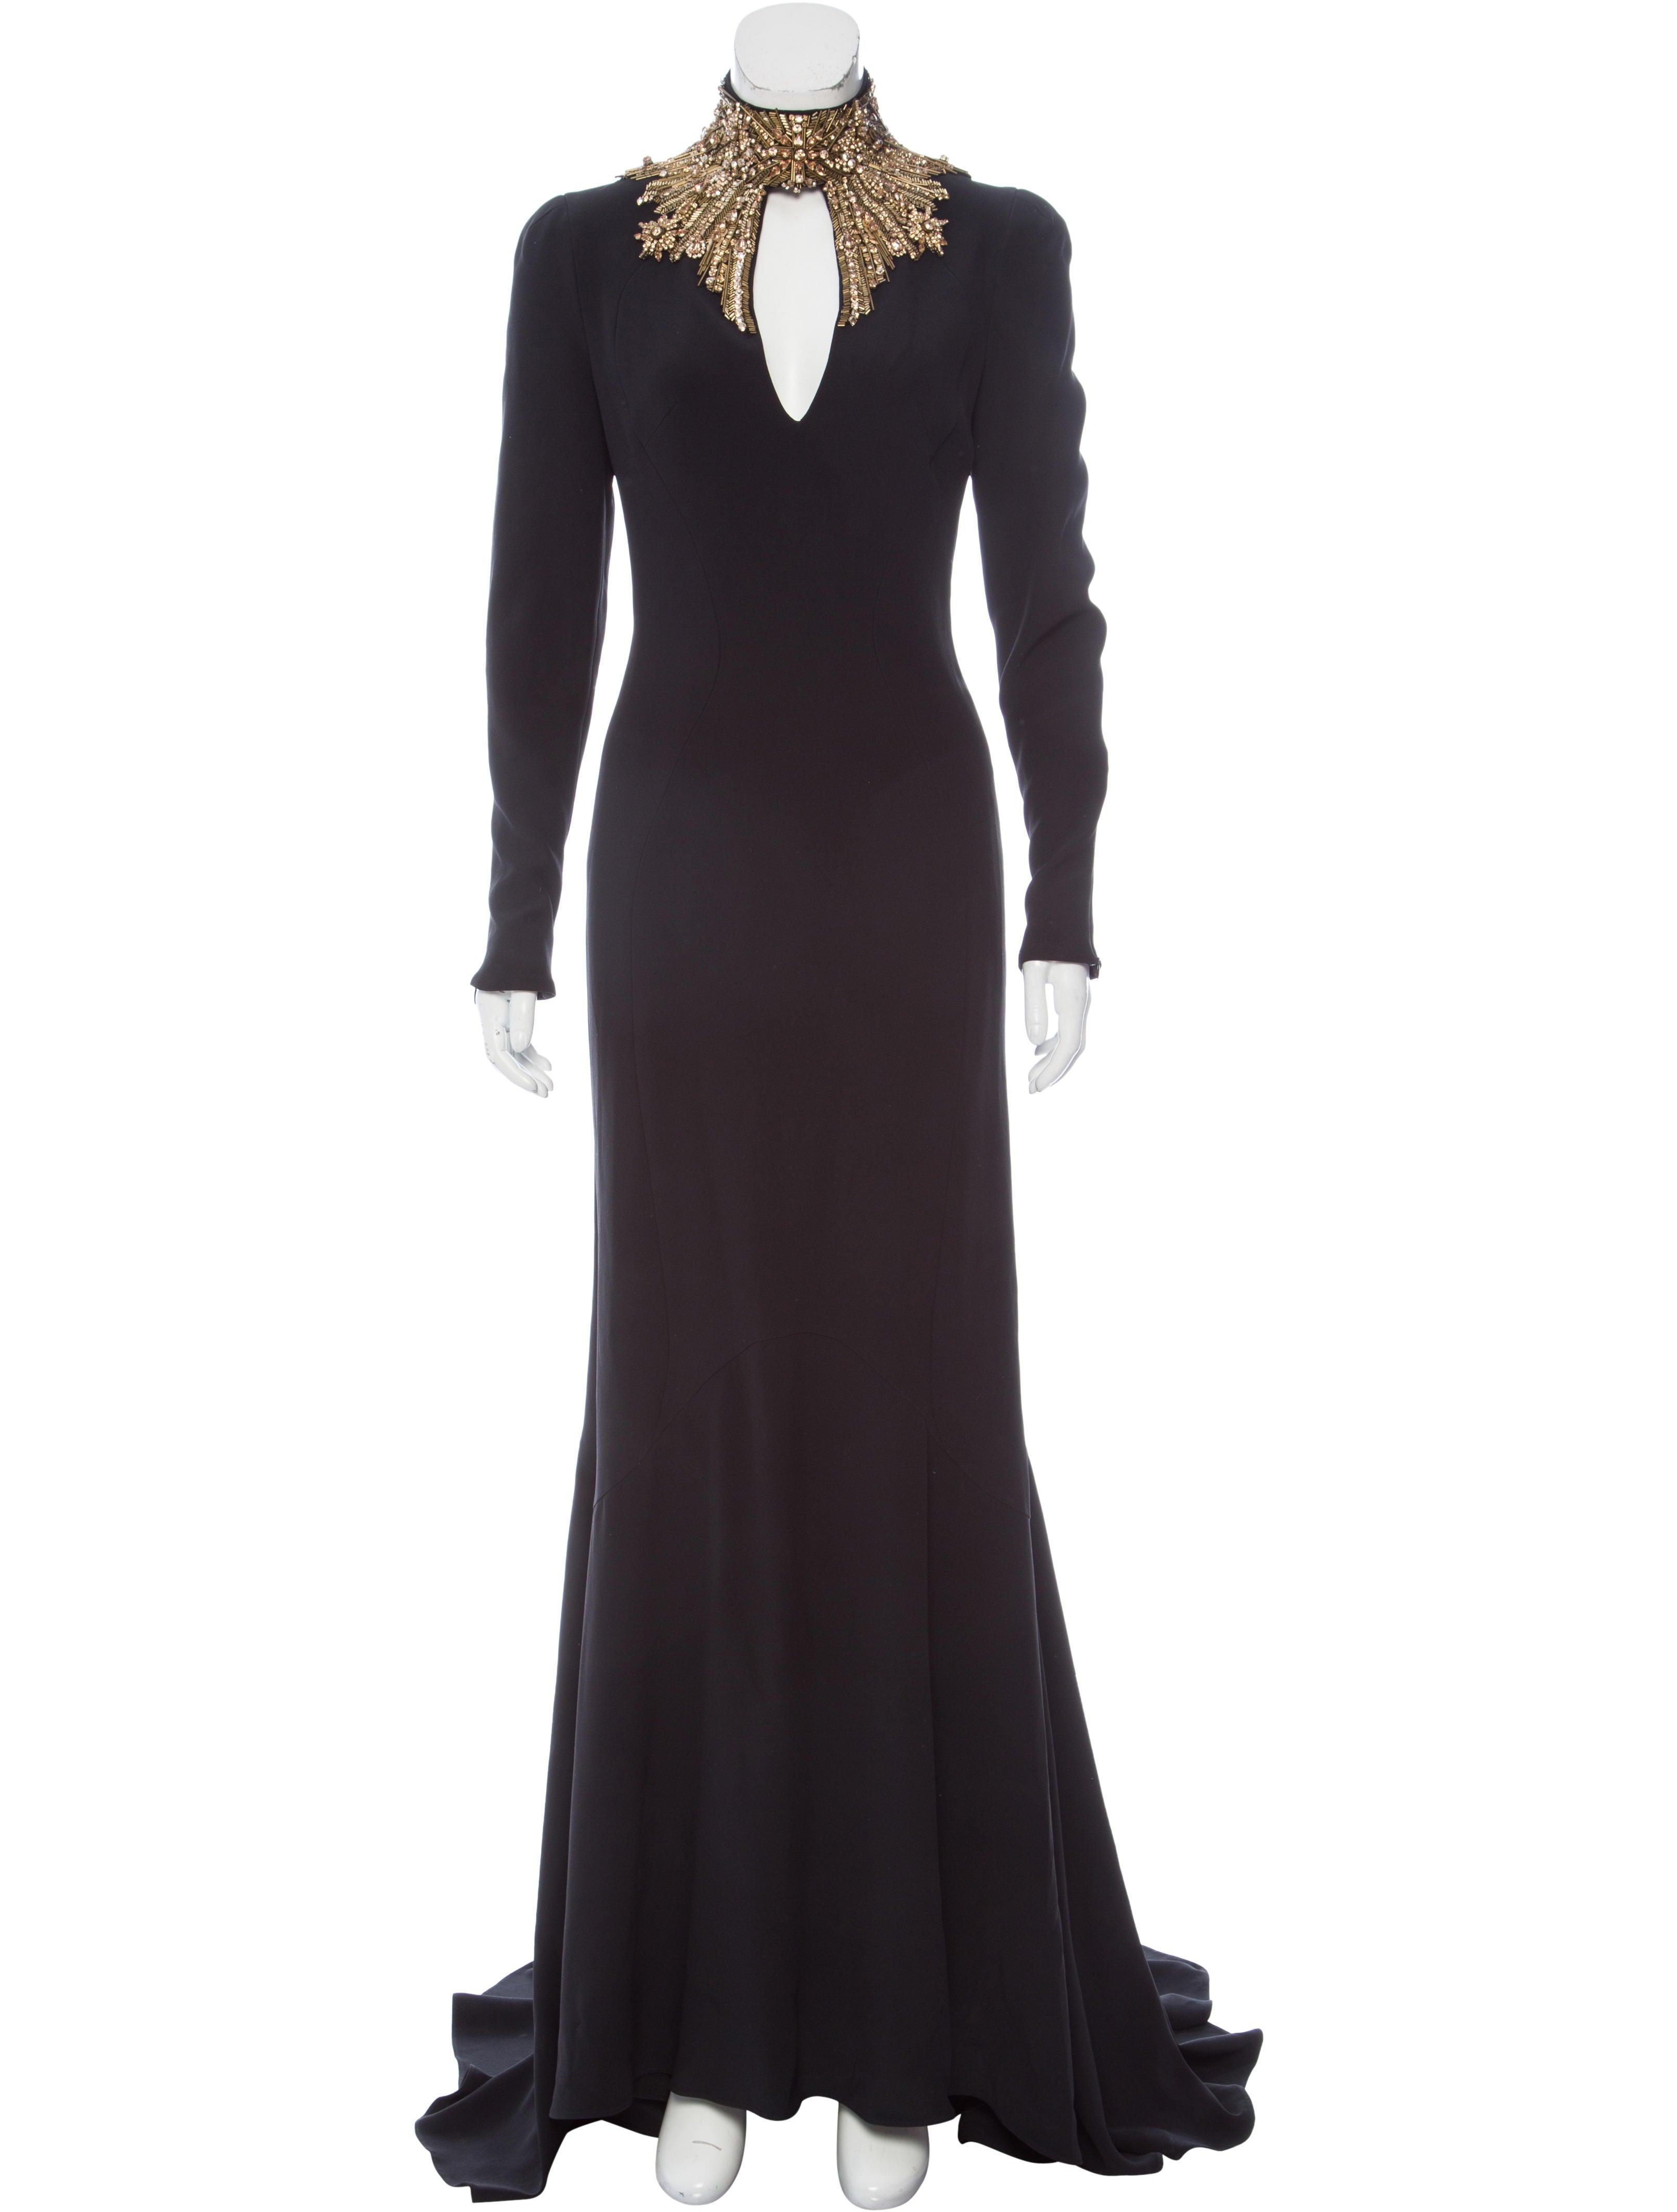 Alexander Mcqueen Embellished Evening Dress Clothing